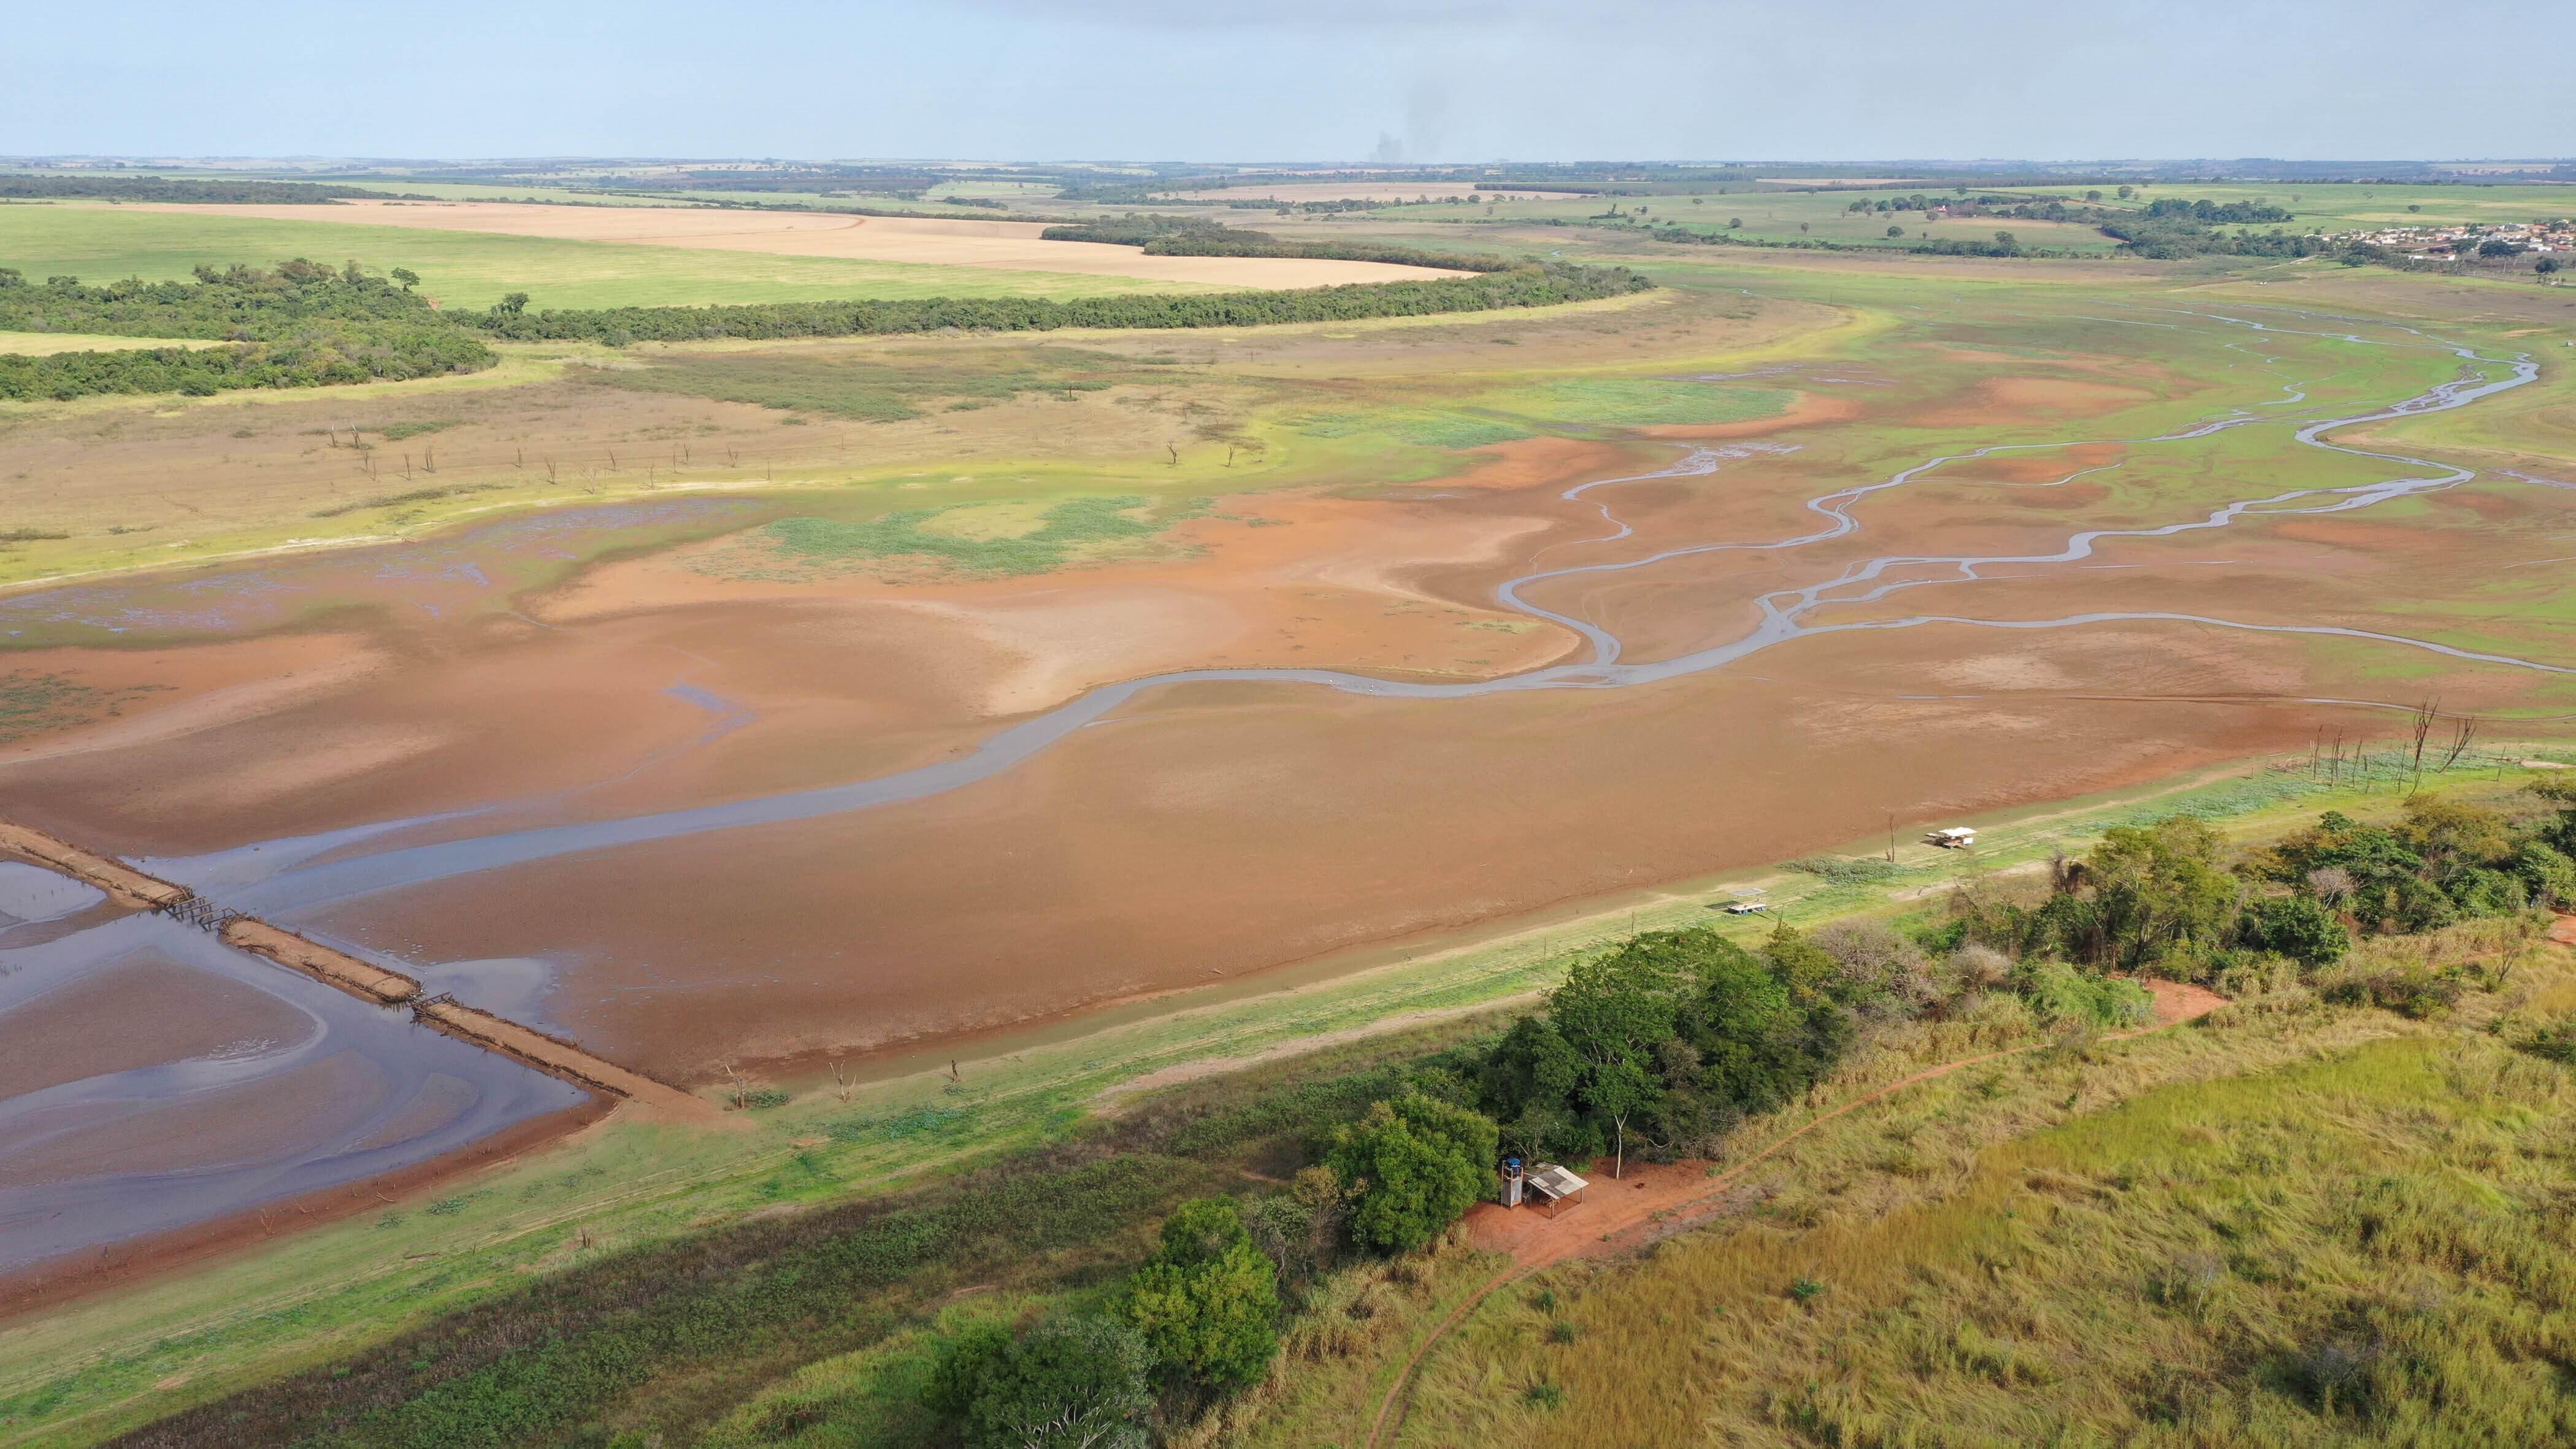 represa; crise hídrica